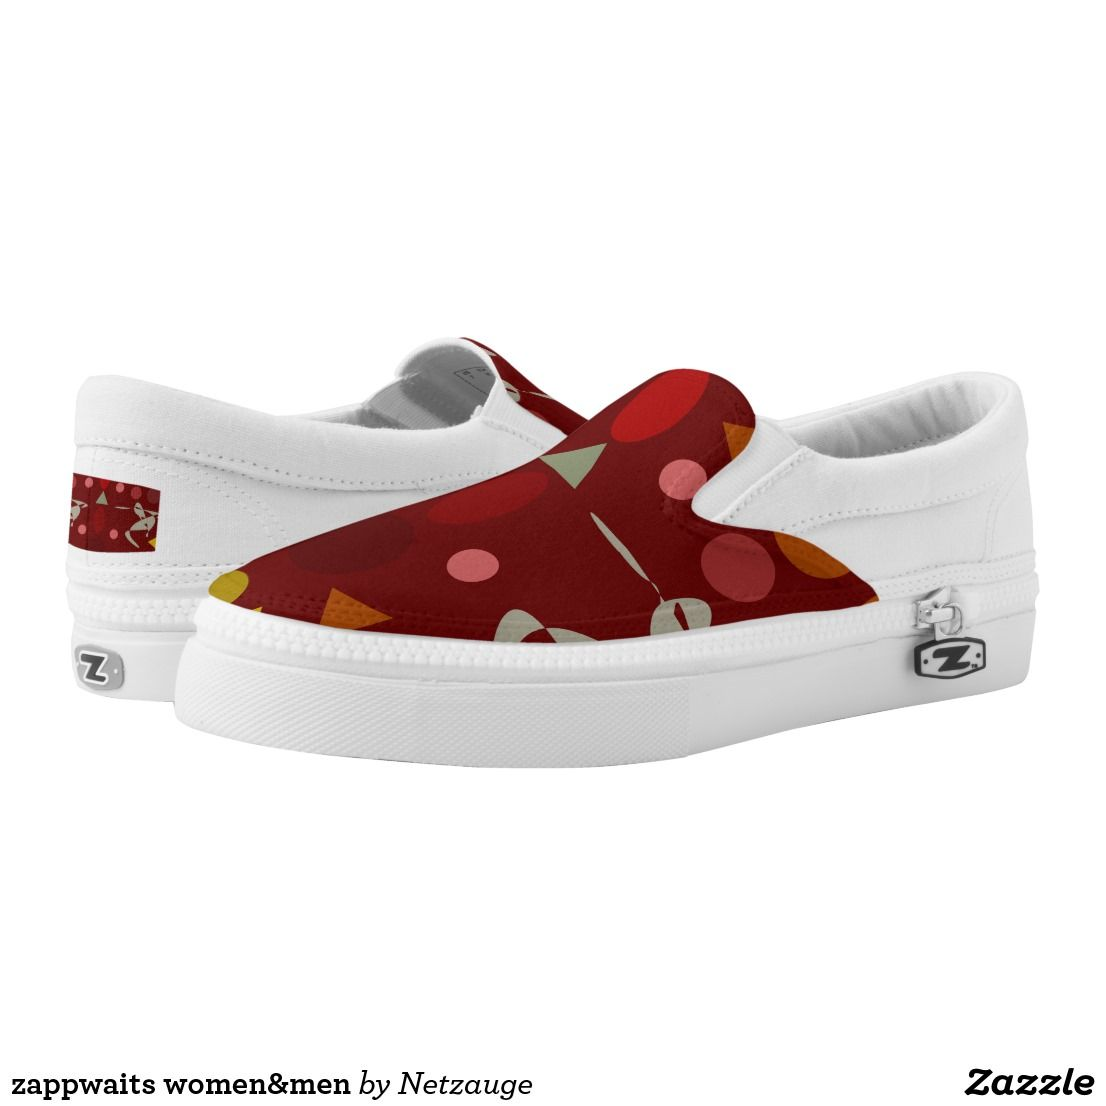 zappwaits women&men Slip On sneaker | | Turnschuhe